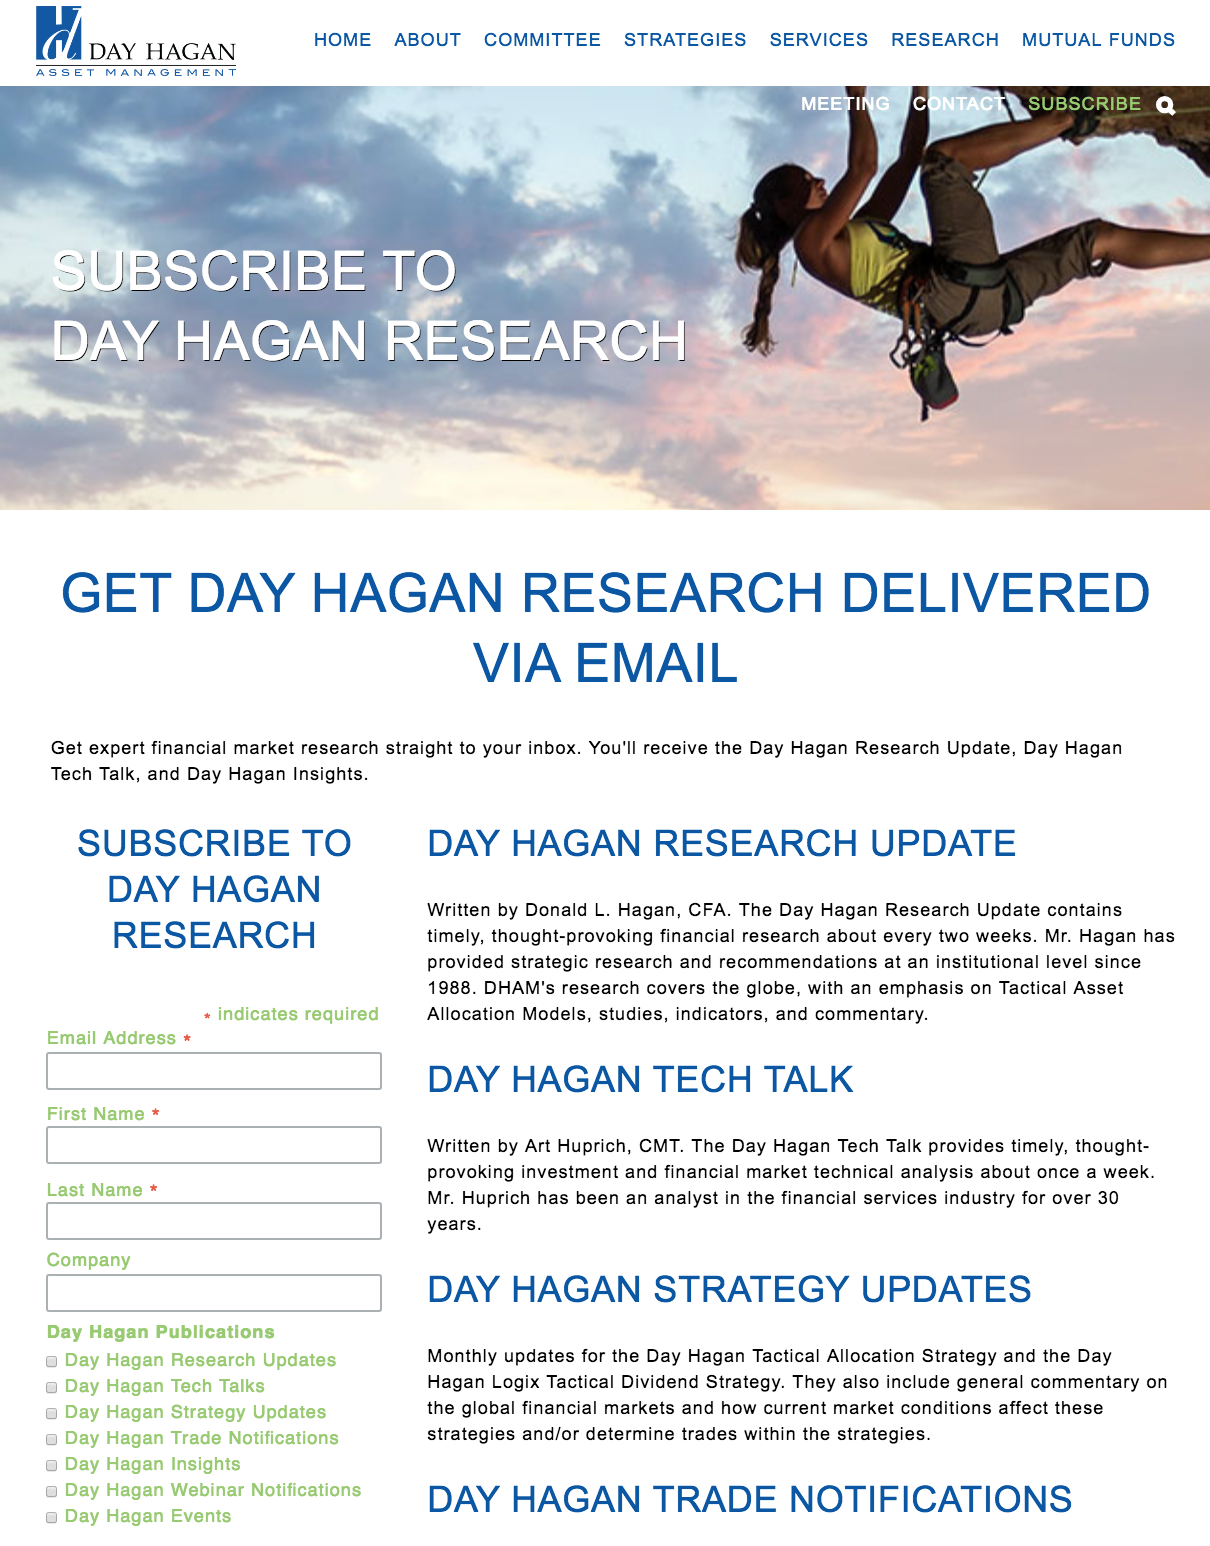 day-hagan-subscribe-page.png